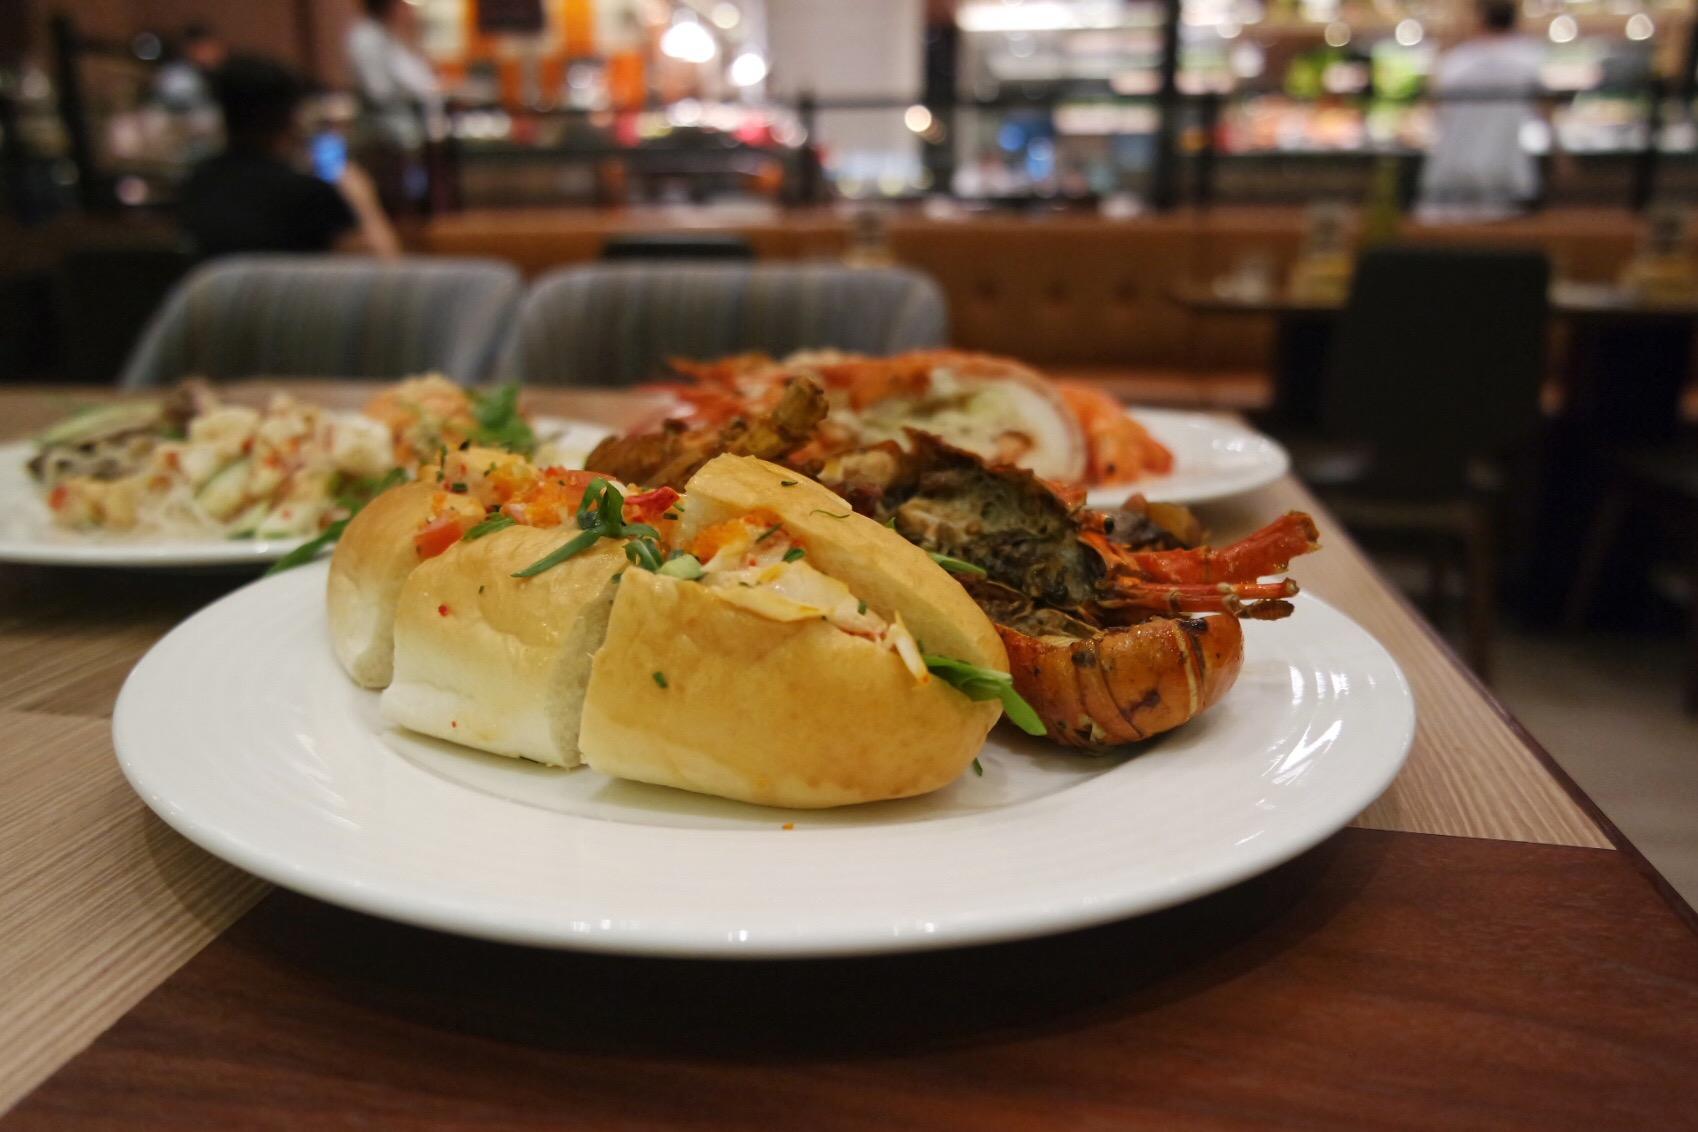 J65 – Eat Through The Week Buffet - AN AFFAIR WITH FOOD